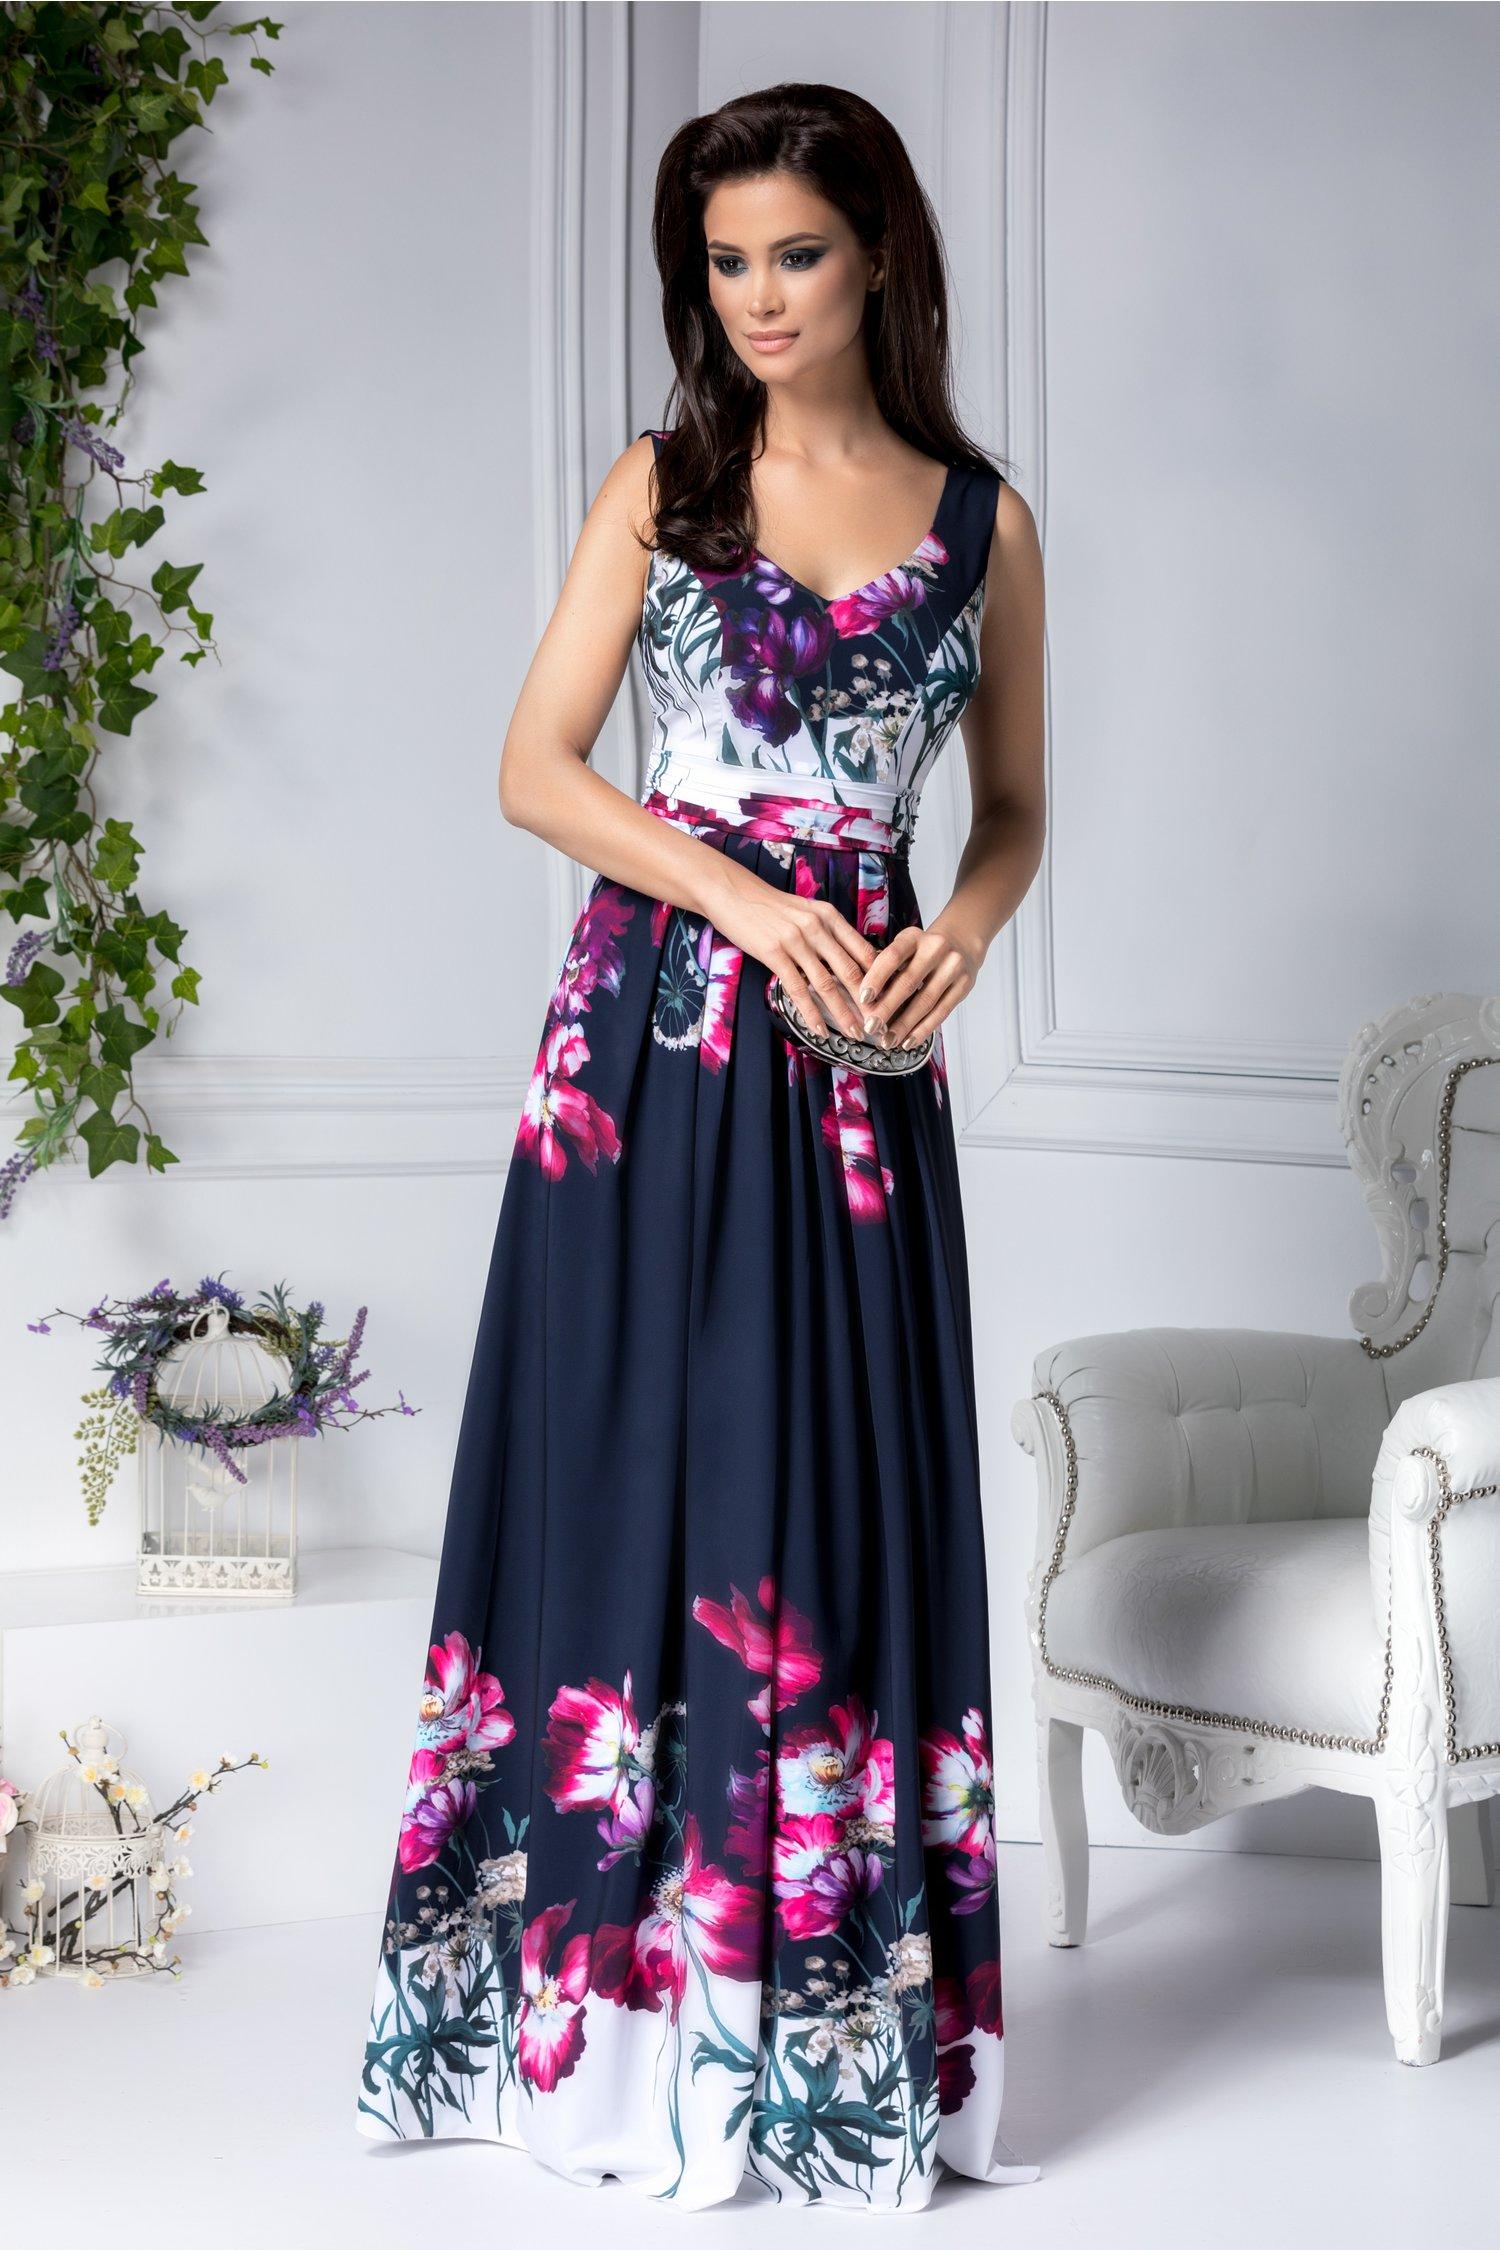 Rochie Leonard Collection lunga bleumarin cu imprimeu floral